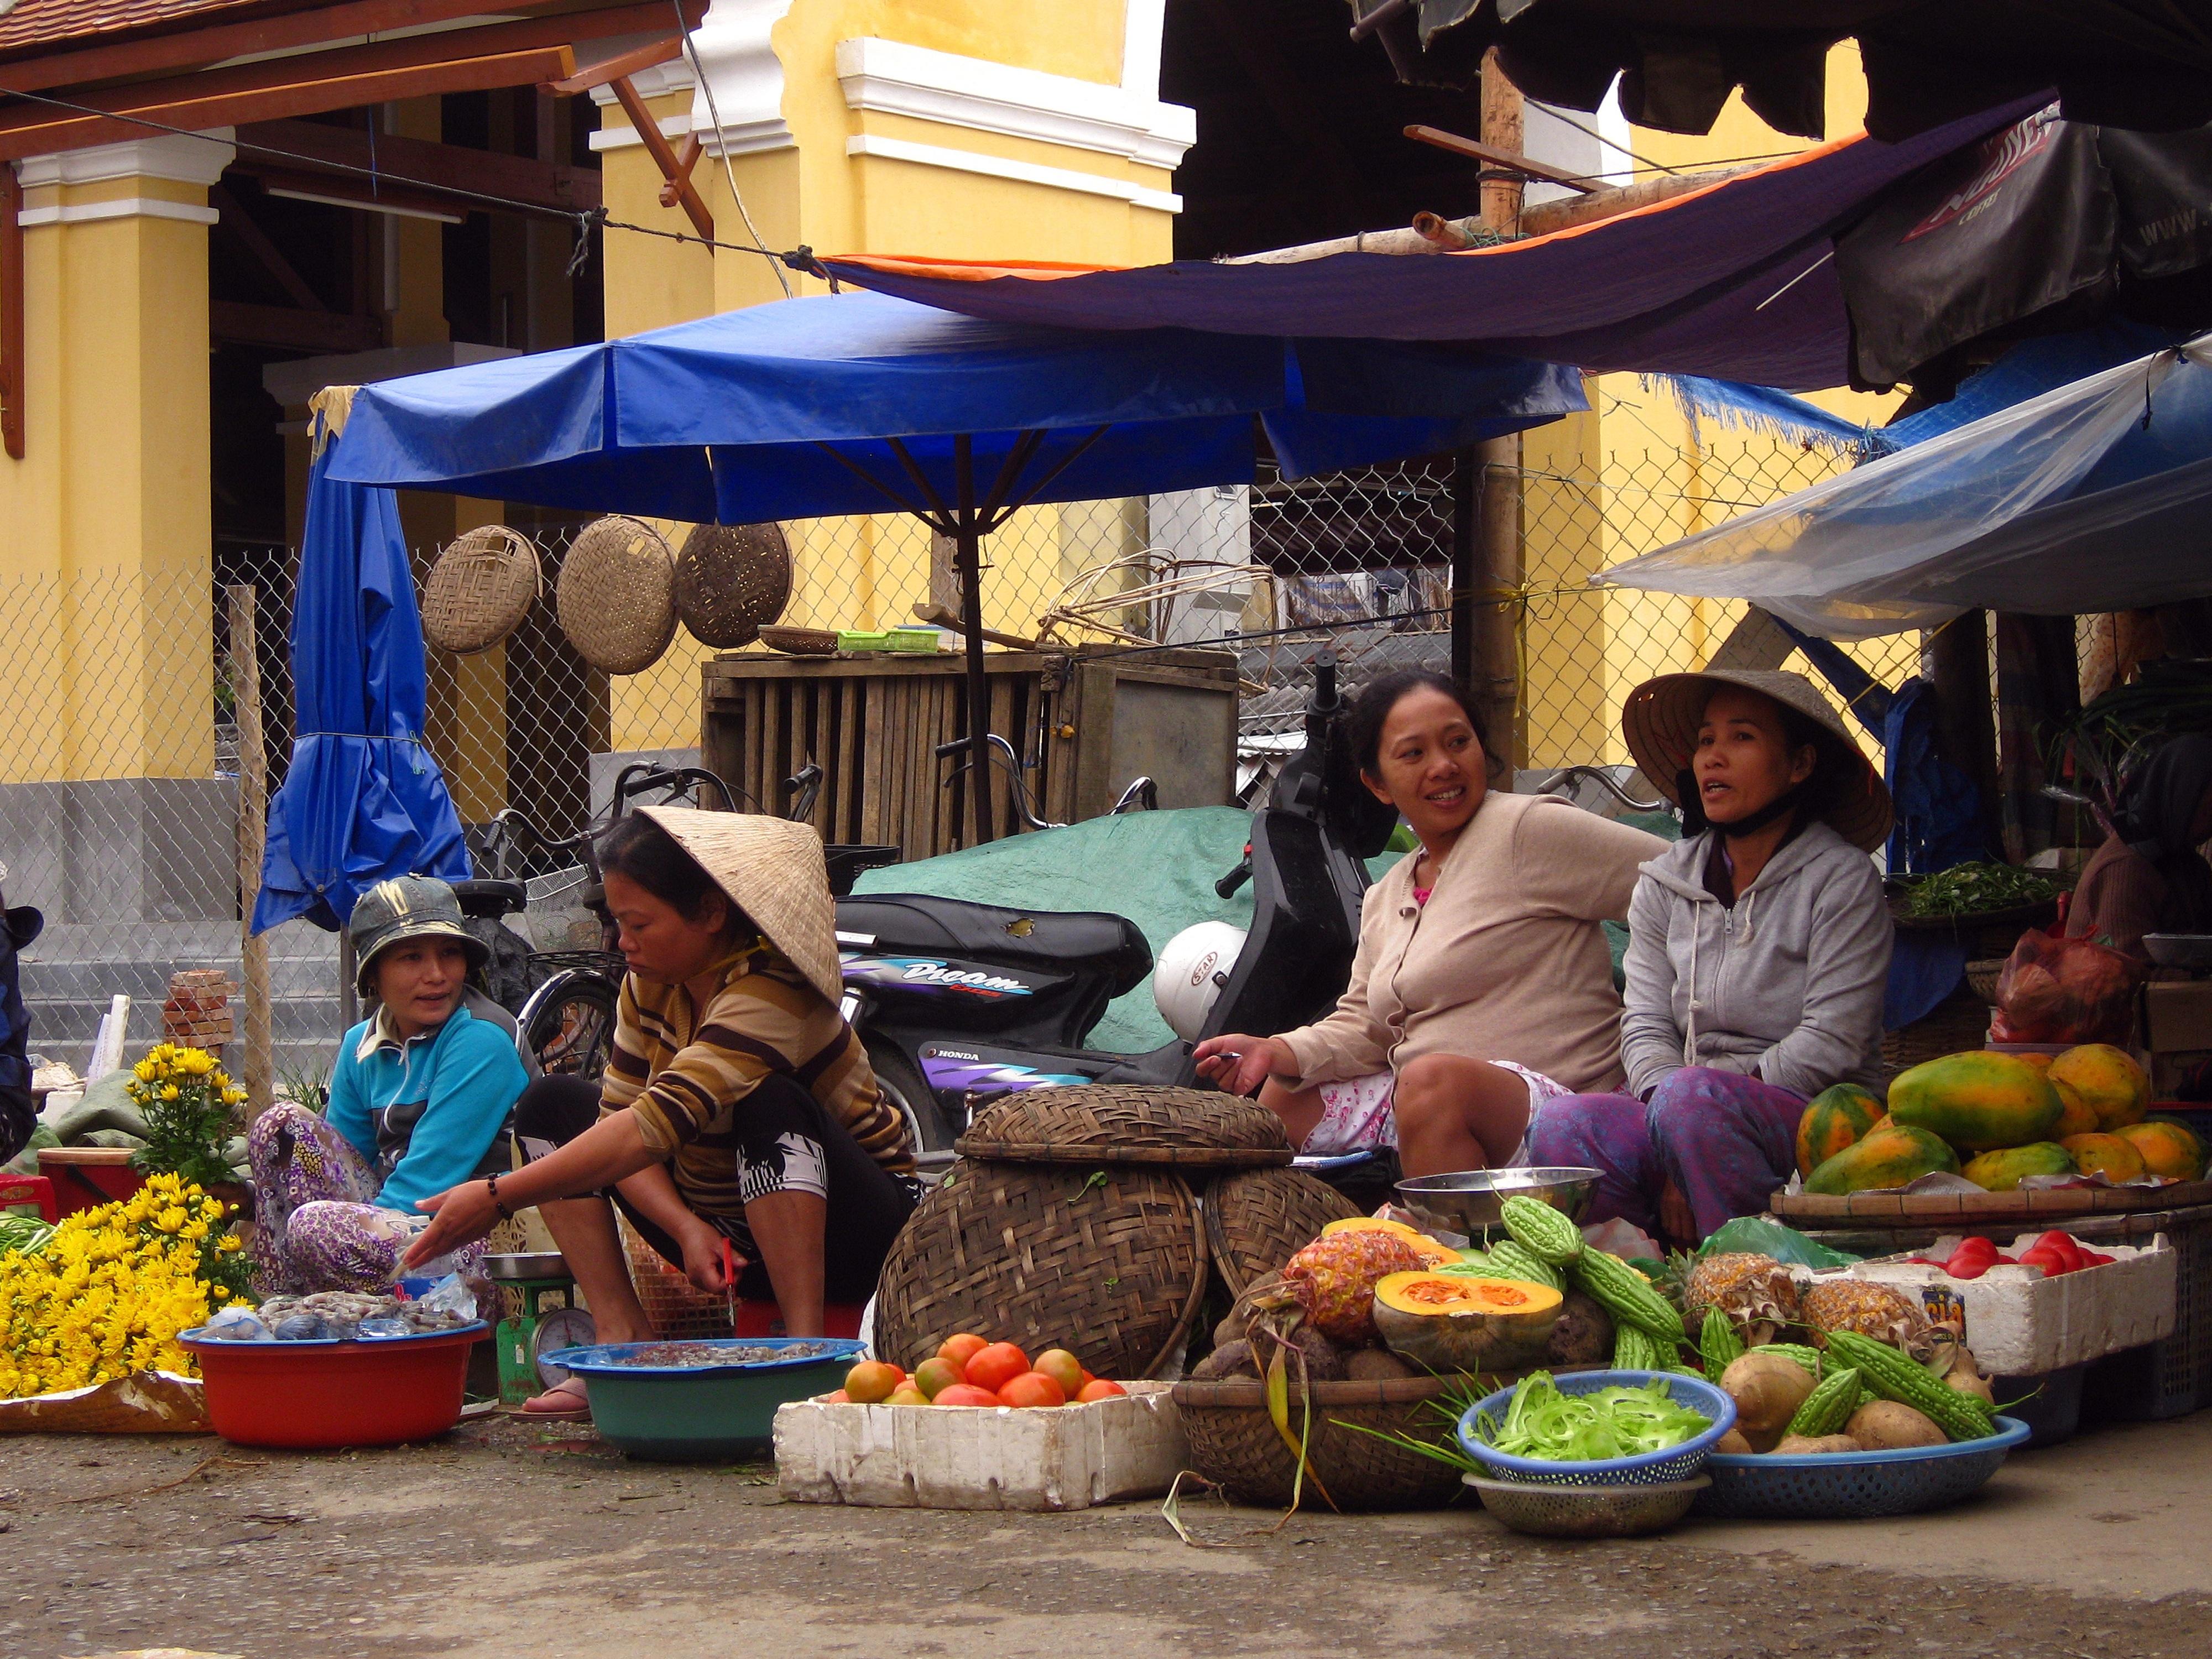 free images street city food vendor asia bazaar market marketplace colorful public. Black Bedroom Furniture Sets. Home Design Ideas